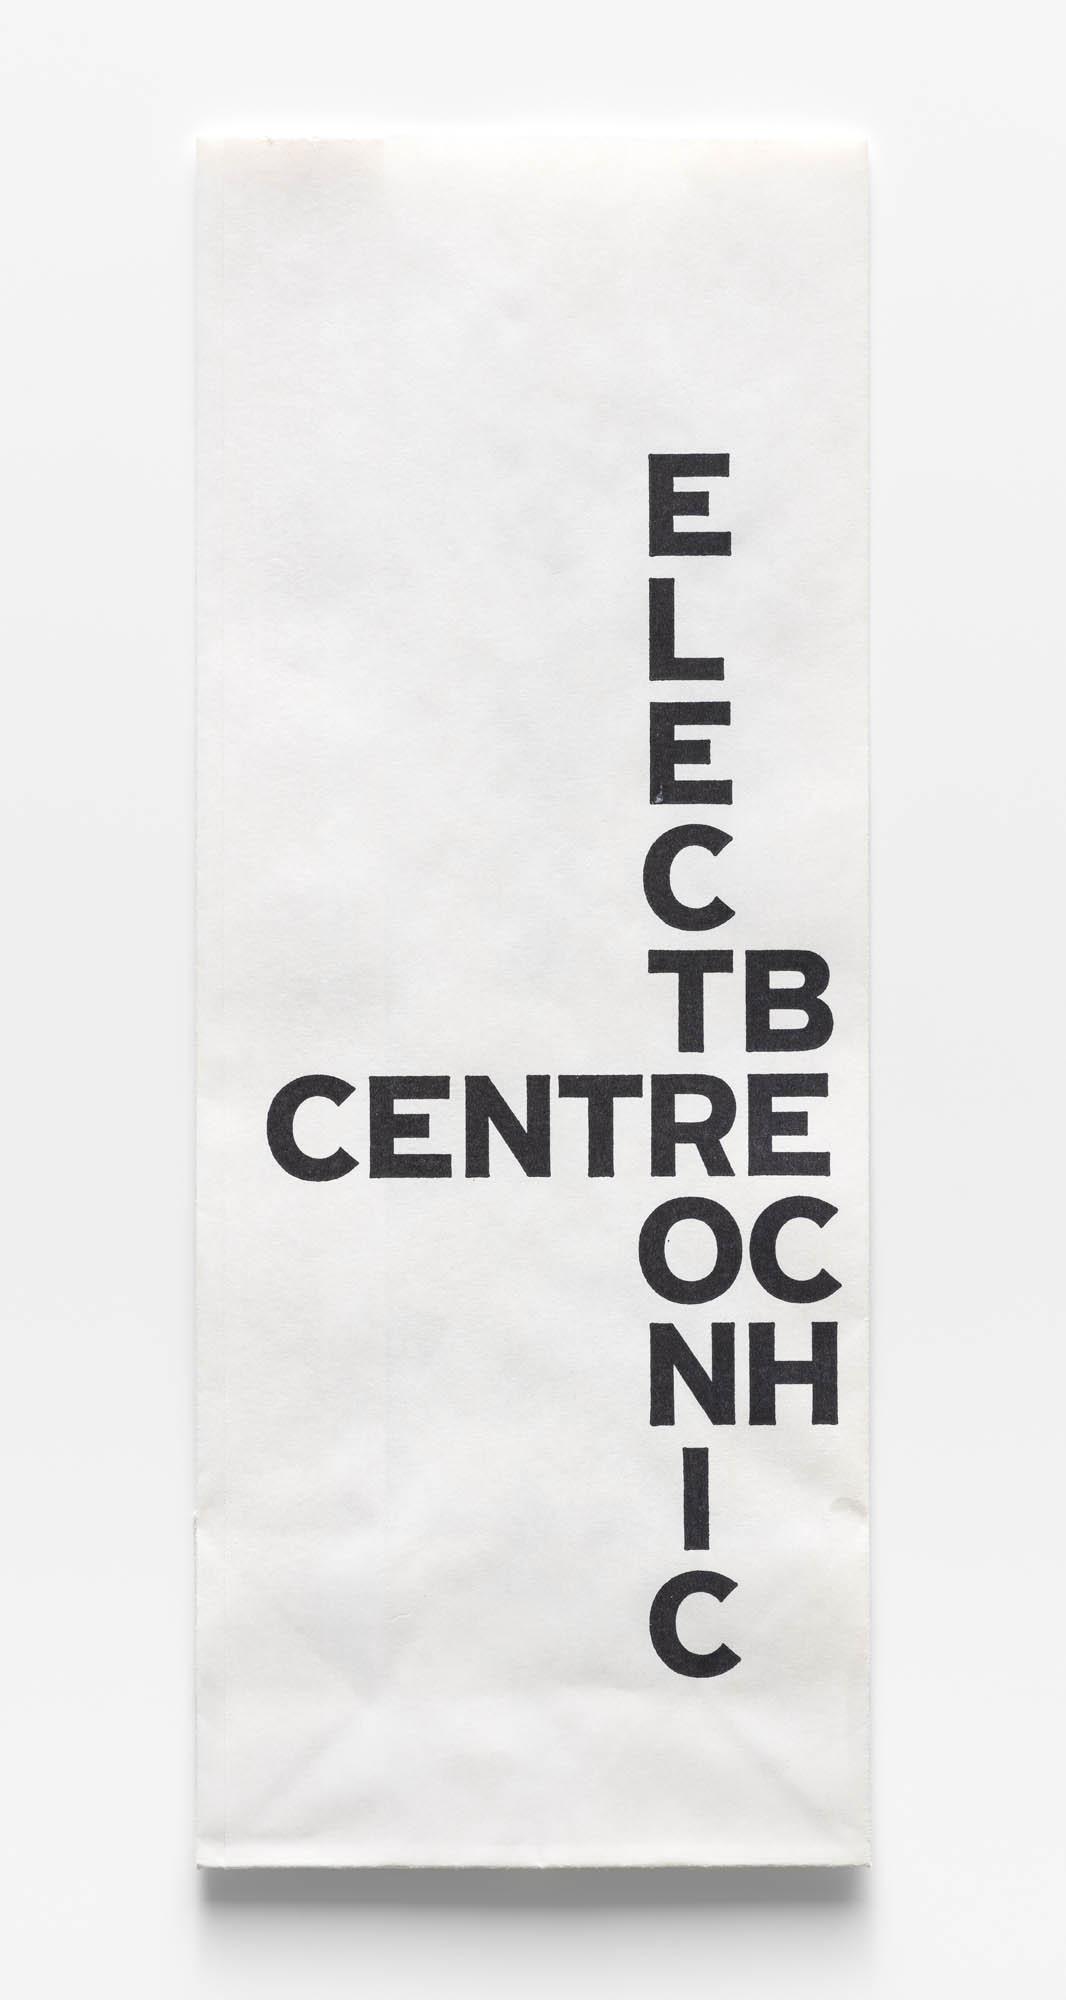 Bech Electronic Centre Karl Gerstner Werbeinserat